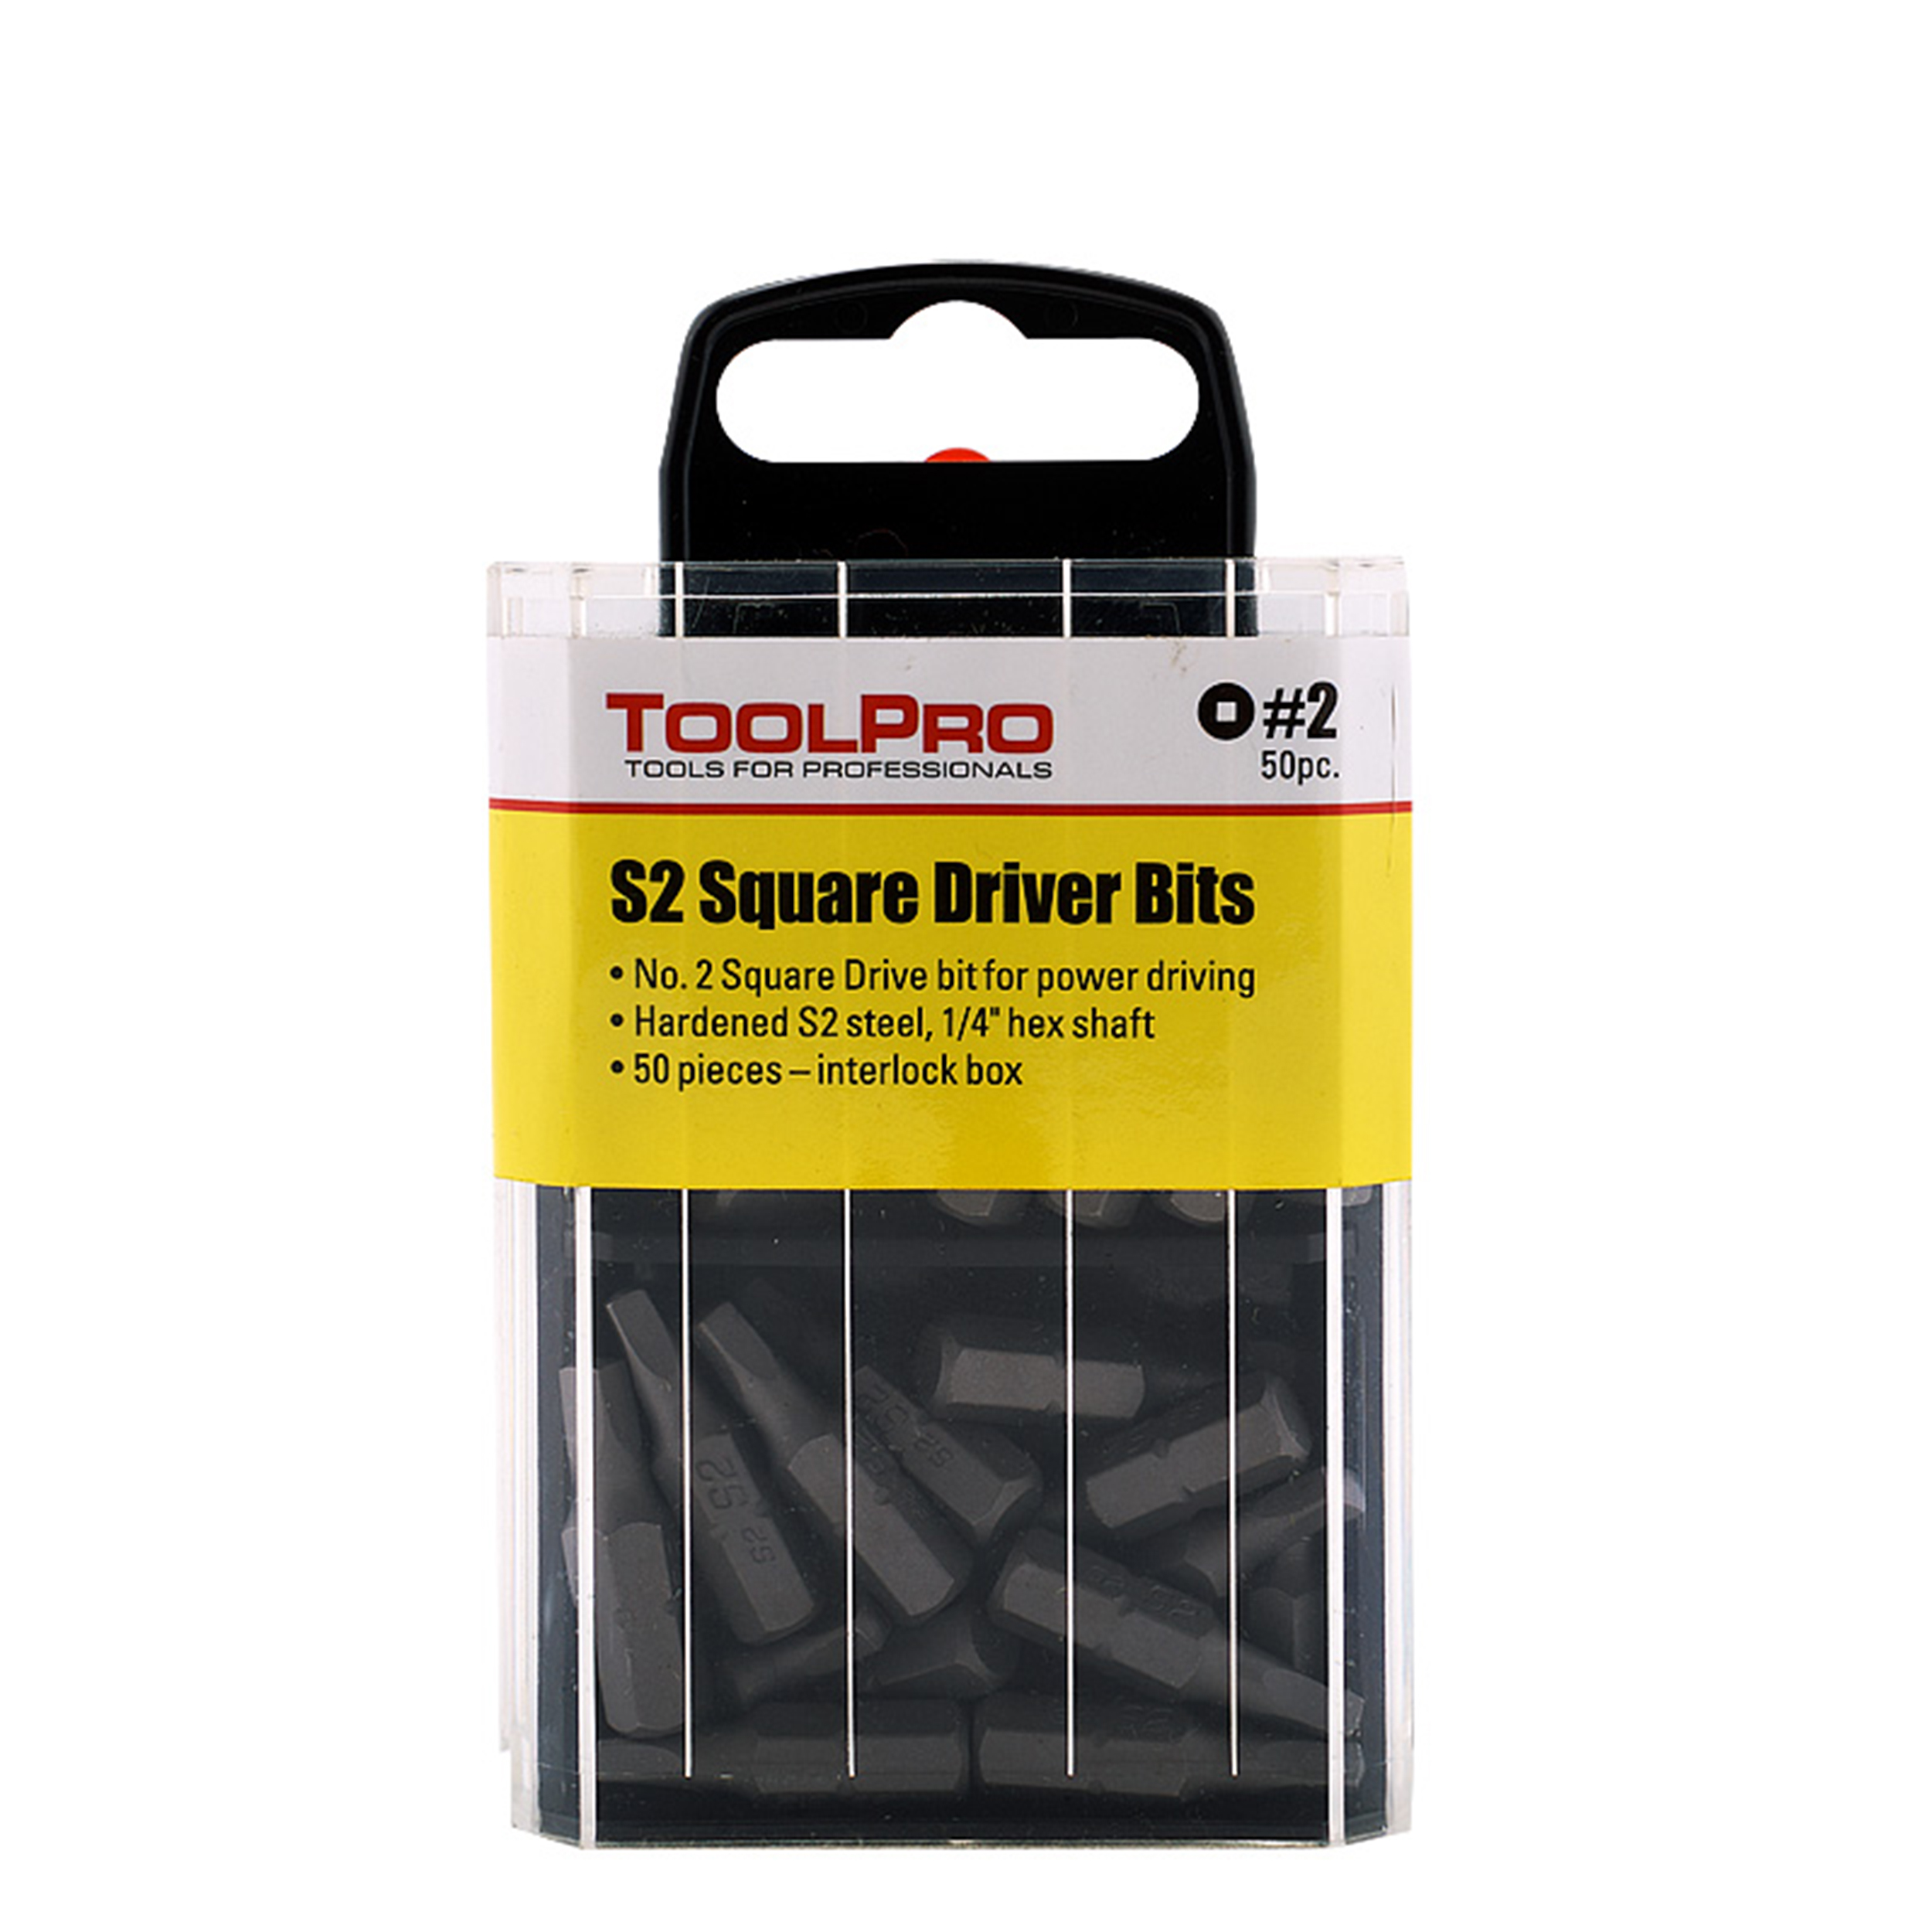 #2 Square Drive Bit, 50-Pack Interlocking Box